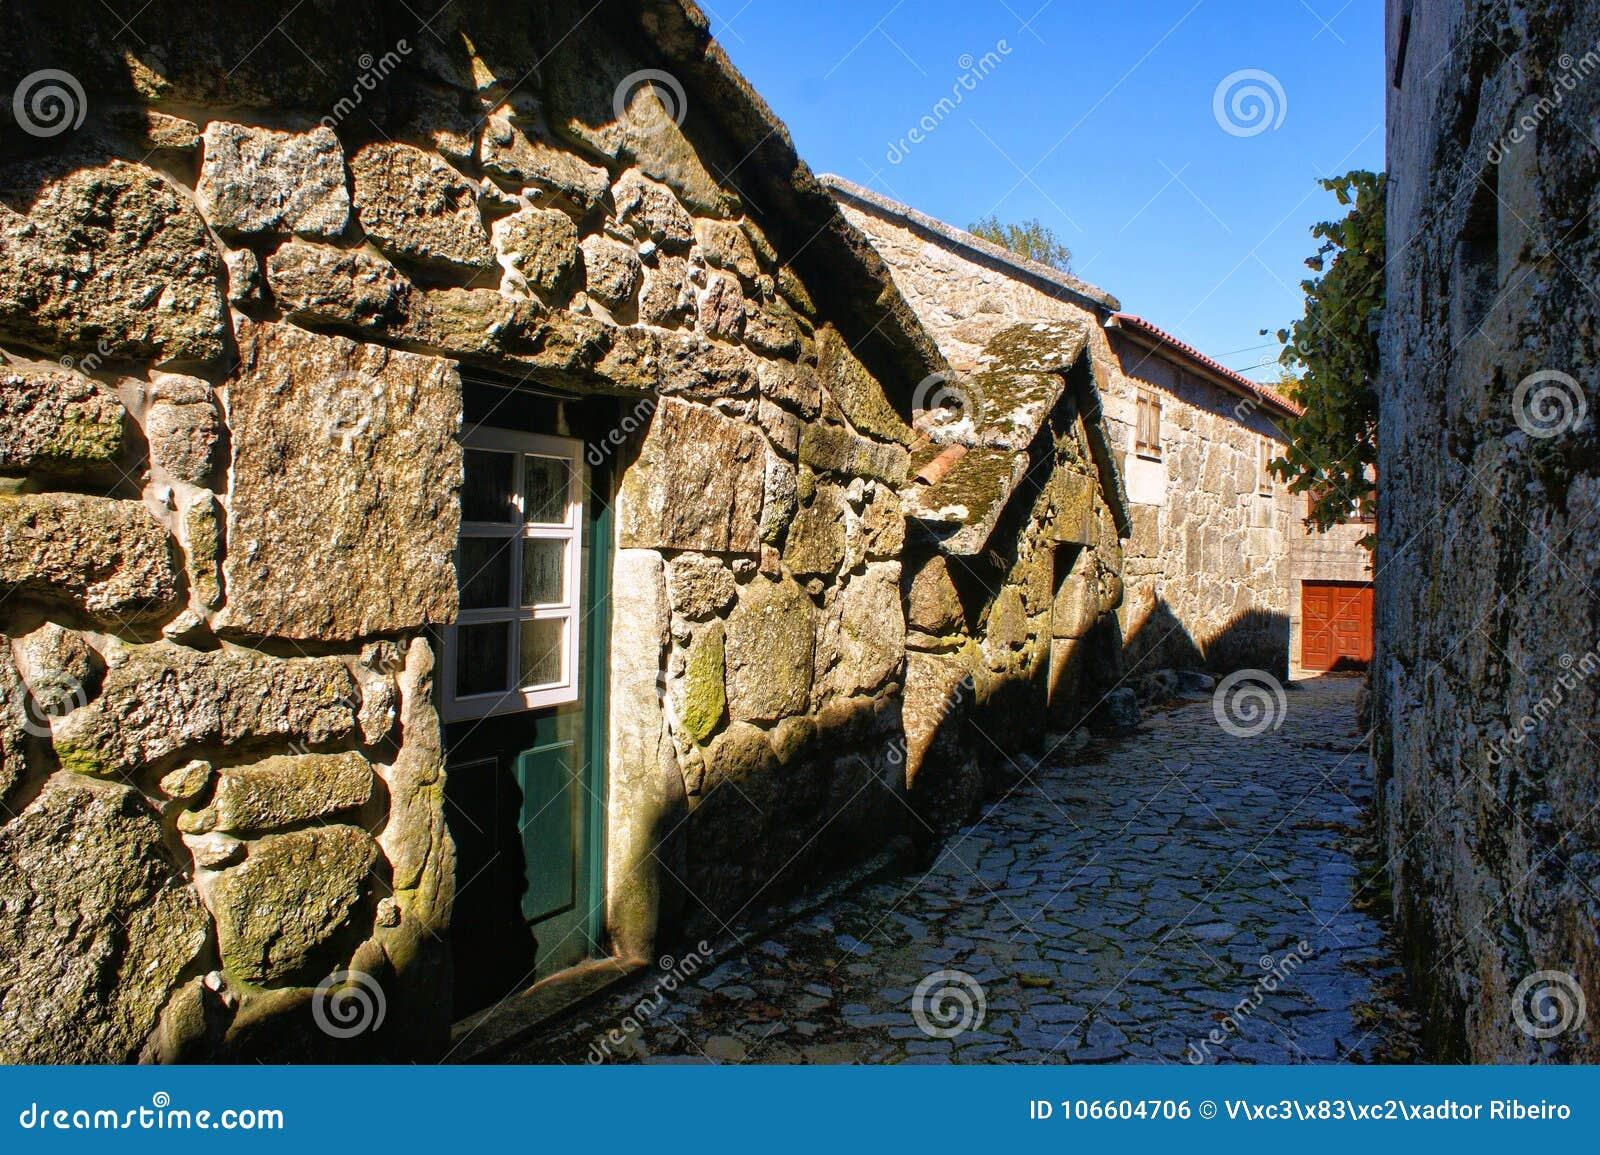 Rural village in National Park of Peneda Geres